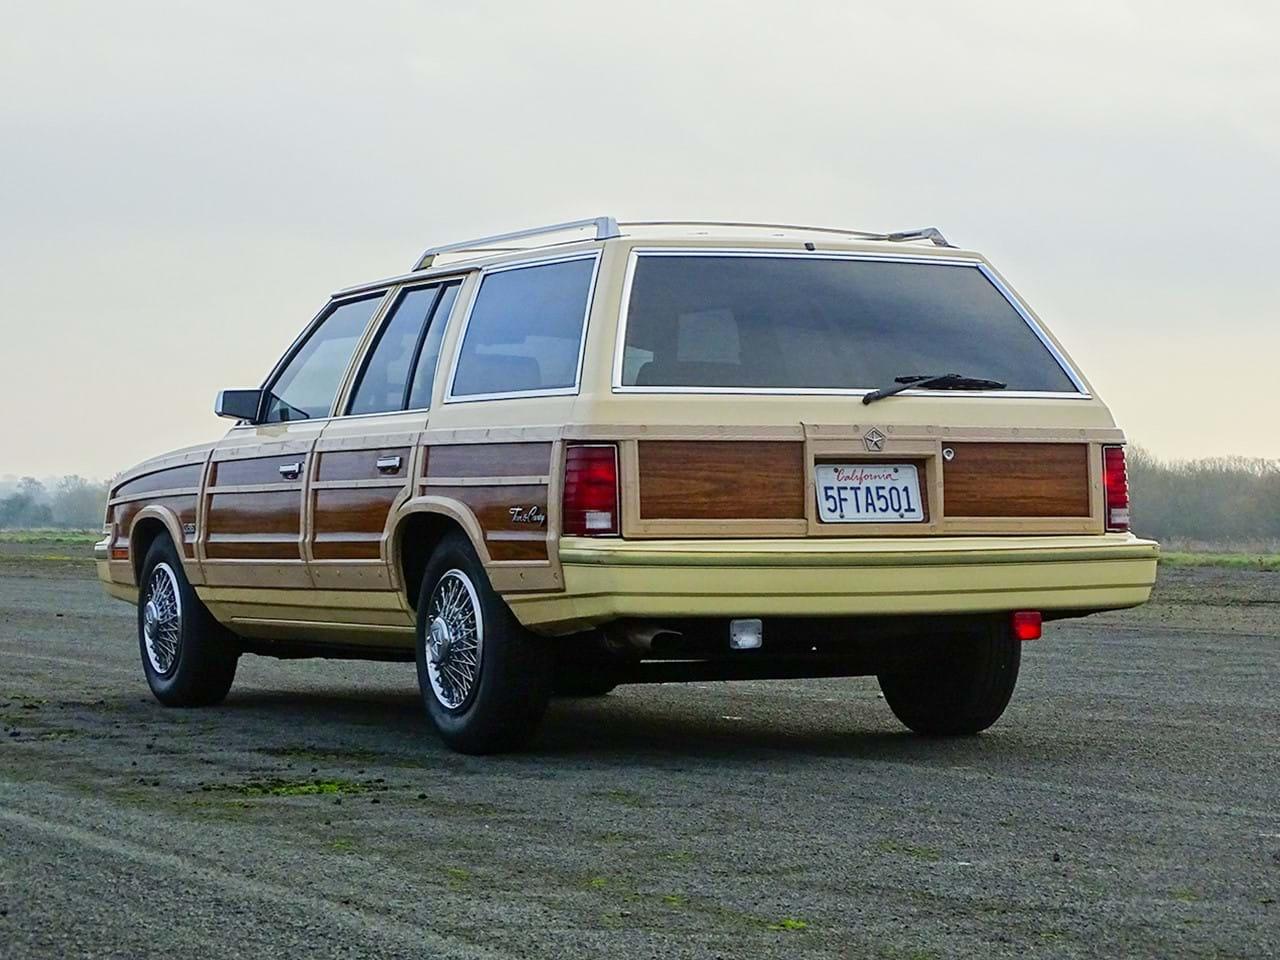 1985 Chrysler LeBaron Town and Country Wagon 3/4 rear